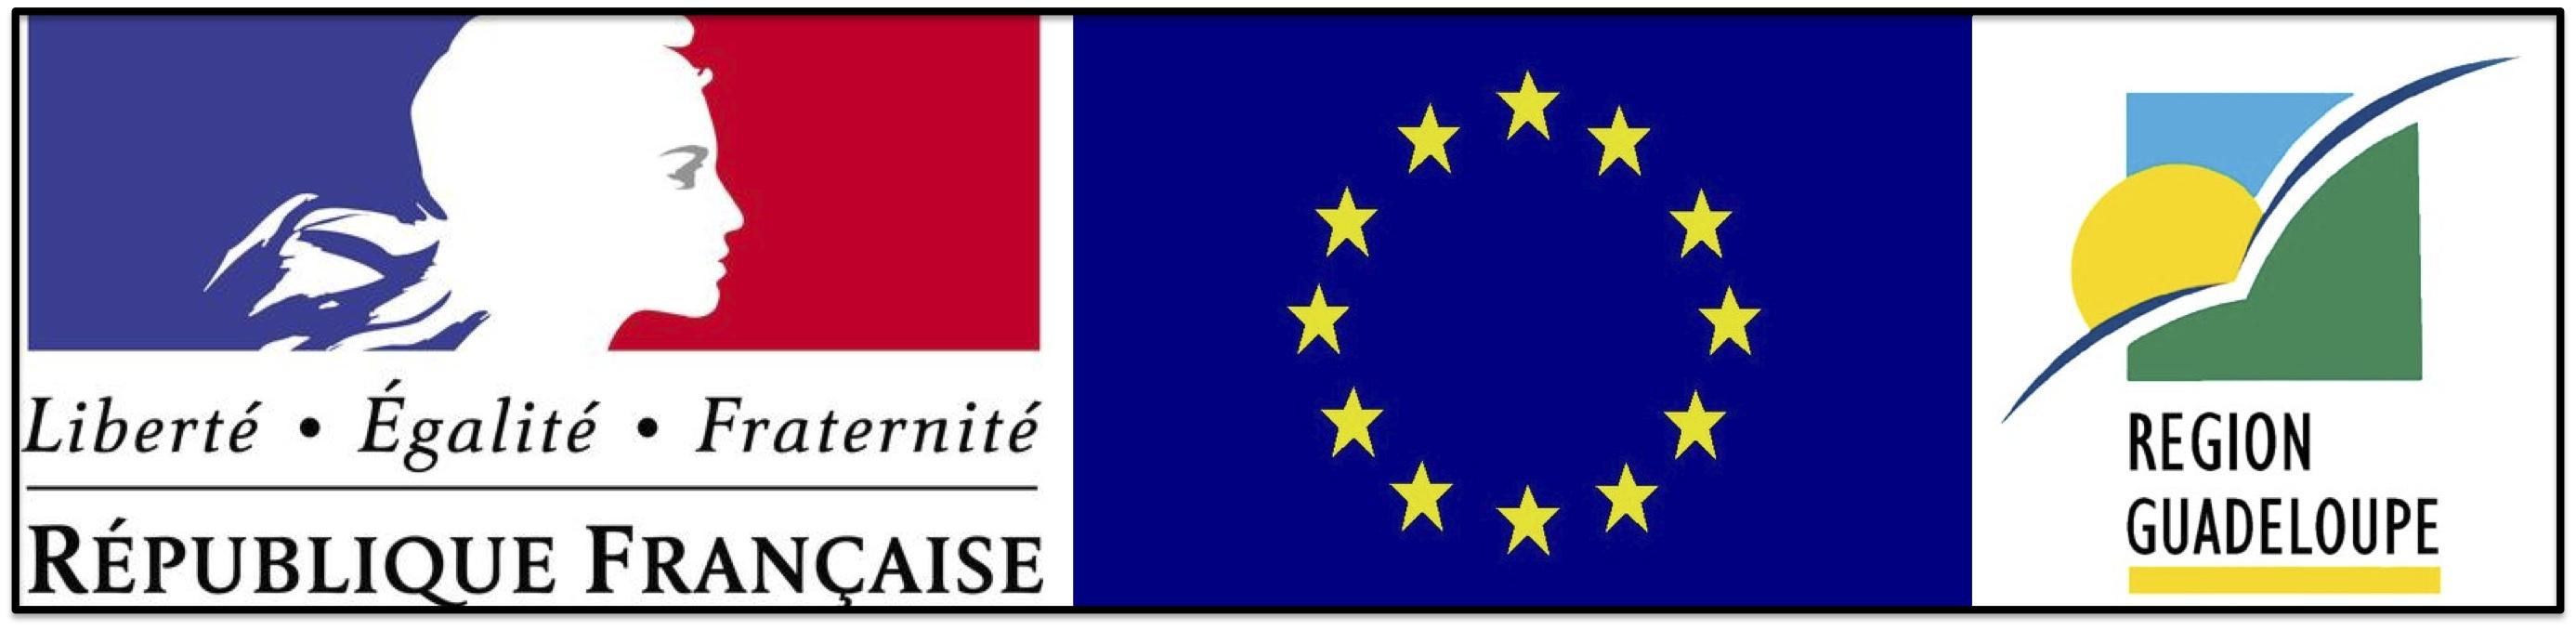 etat europe region-2